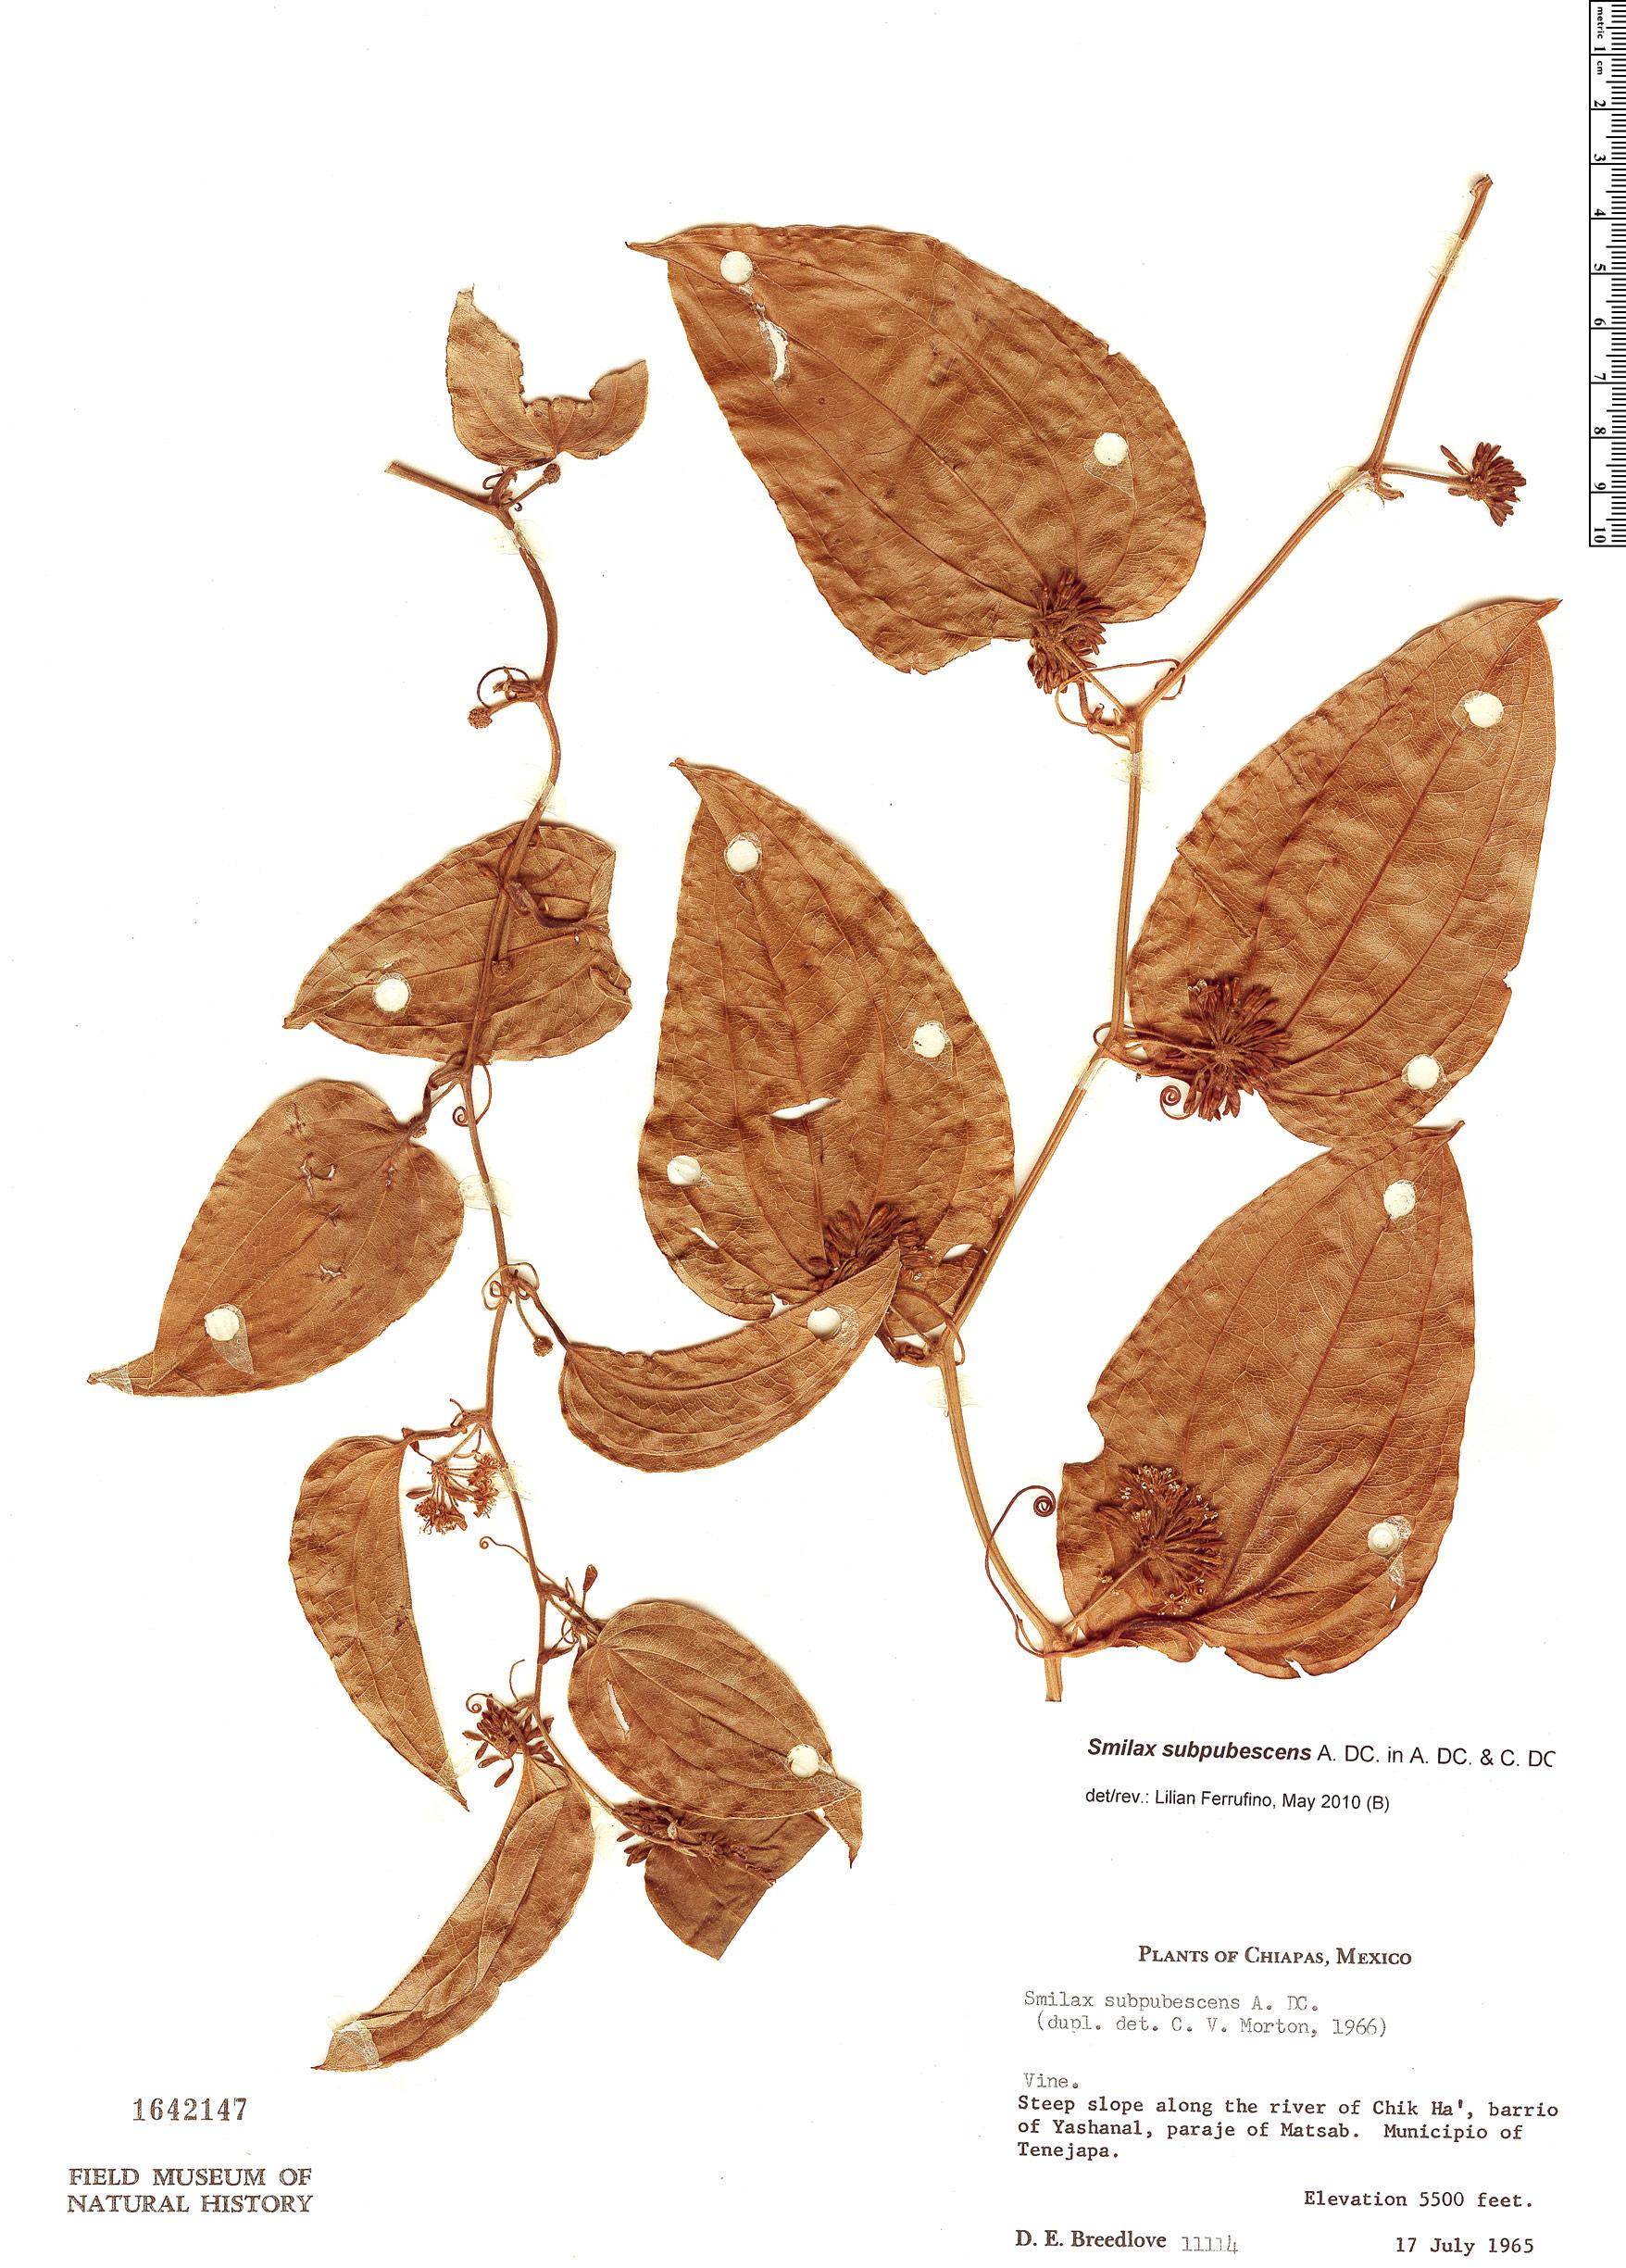 Specimen: Smilax subpubescens